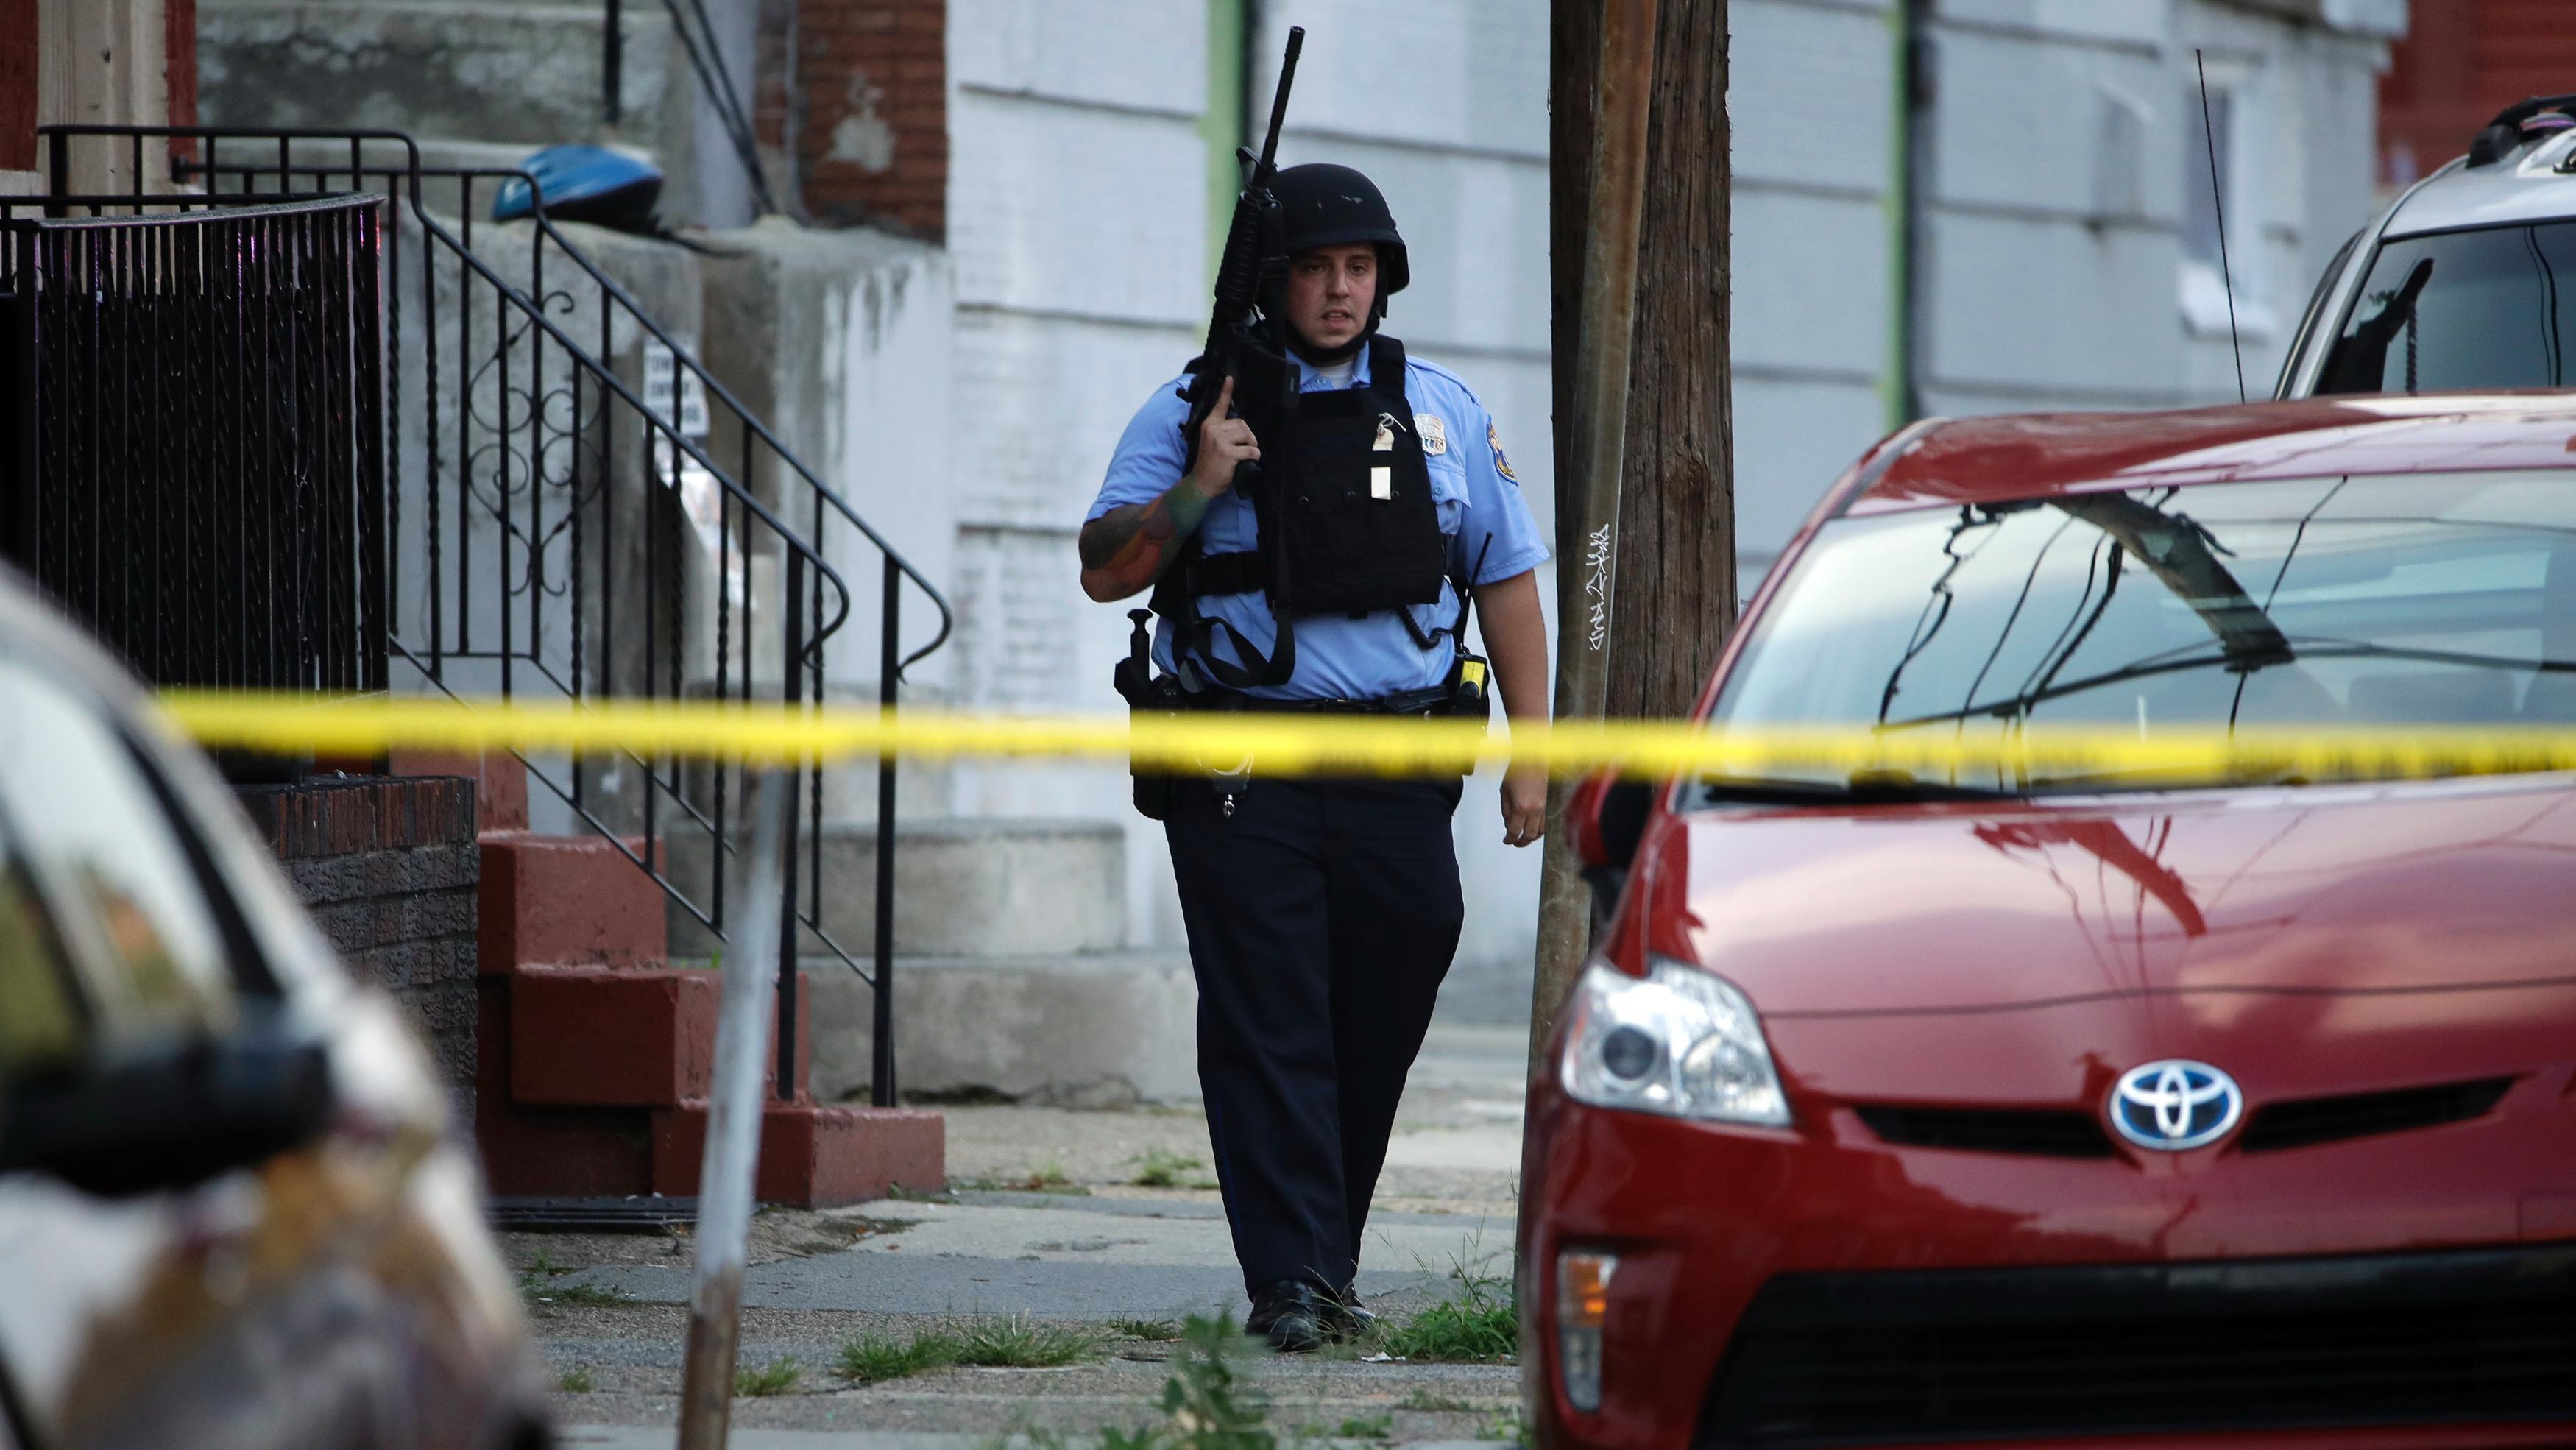 Philadelphia shooting: Suspect accused of shooting 6